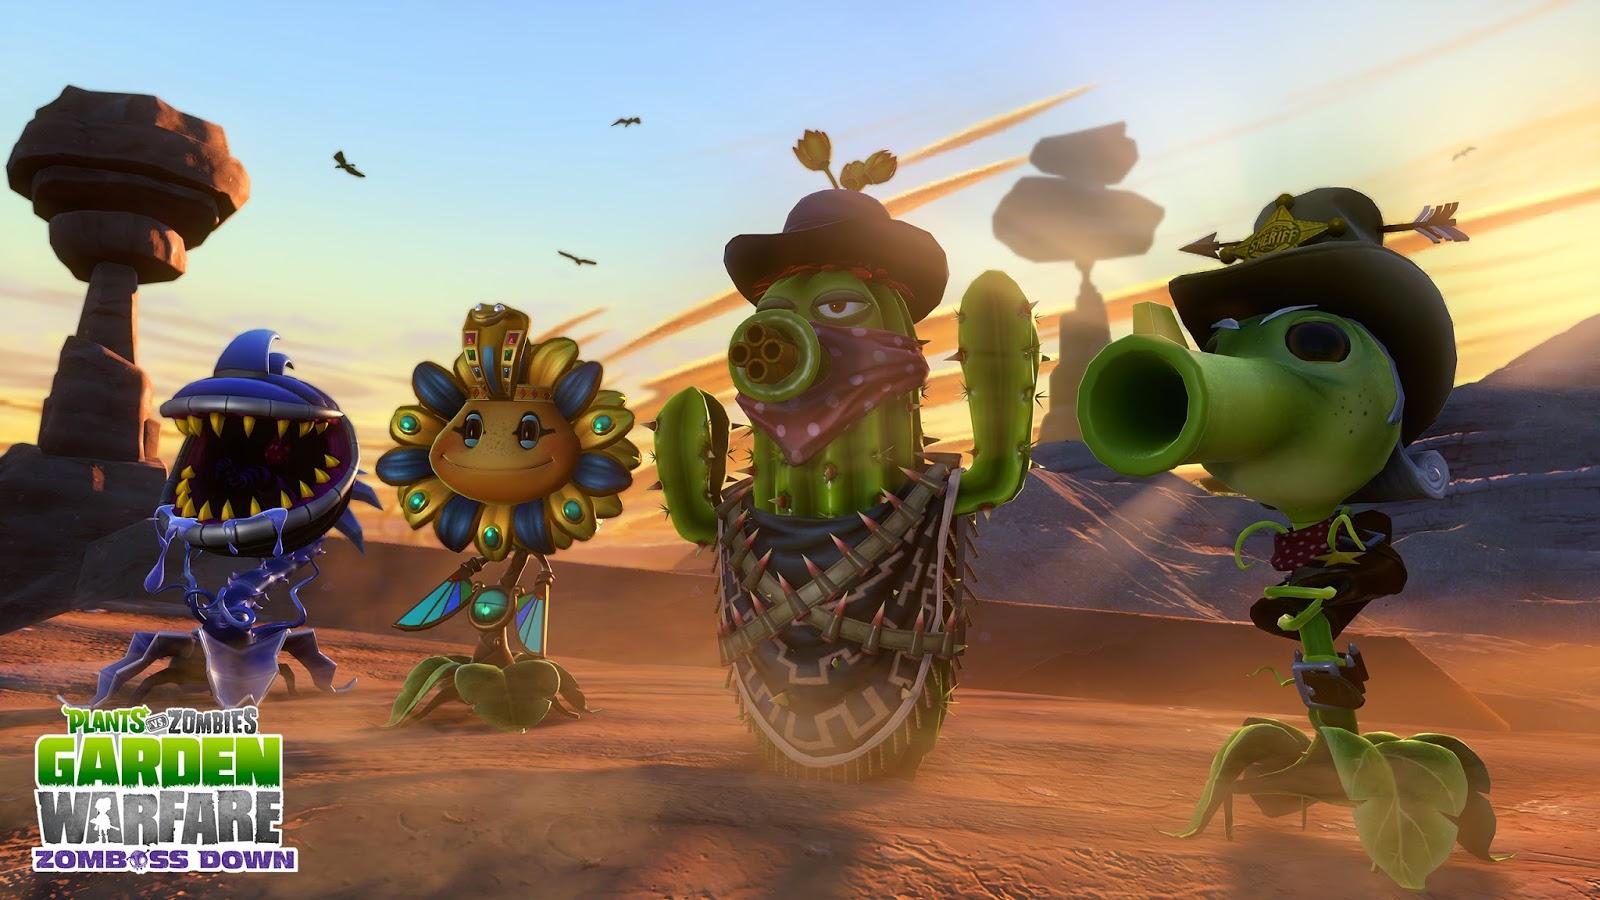 Игра Plants vs Zombies: Garden Warfare на Playstation 4 продается хуже, чем на Xbox One